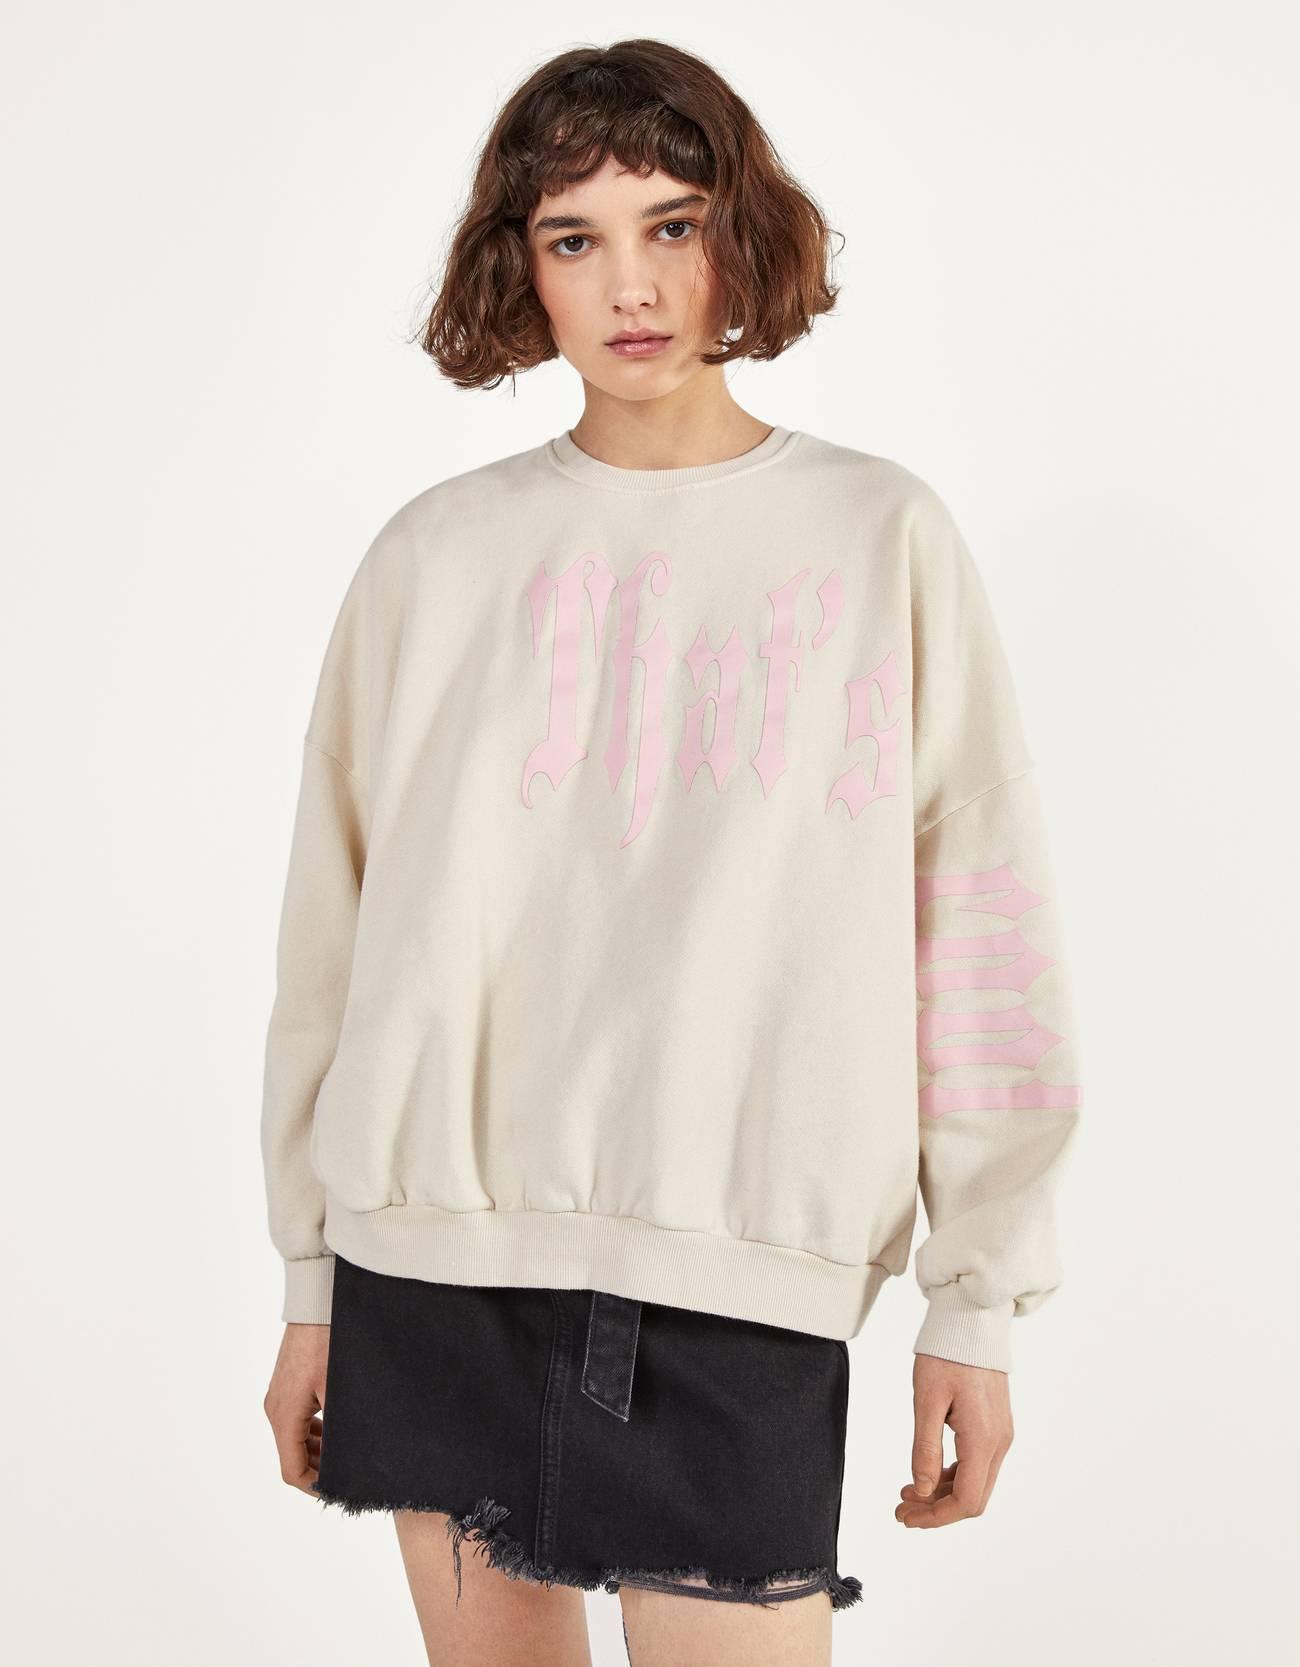 Full sleeve sweatshirt with print